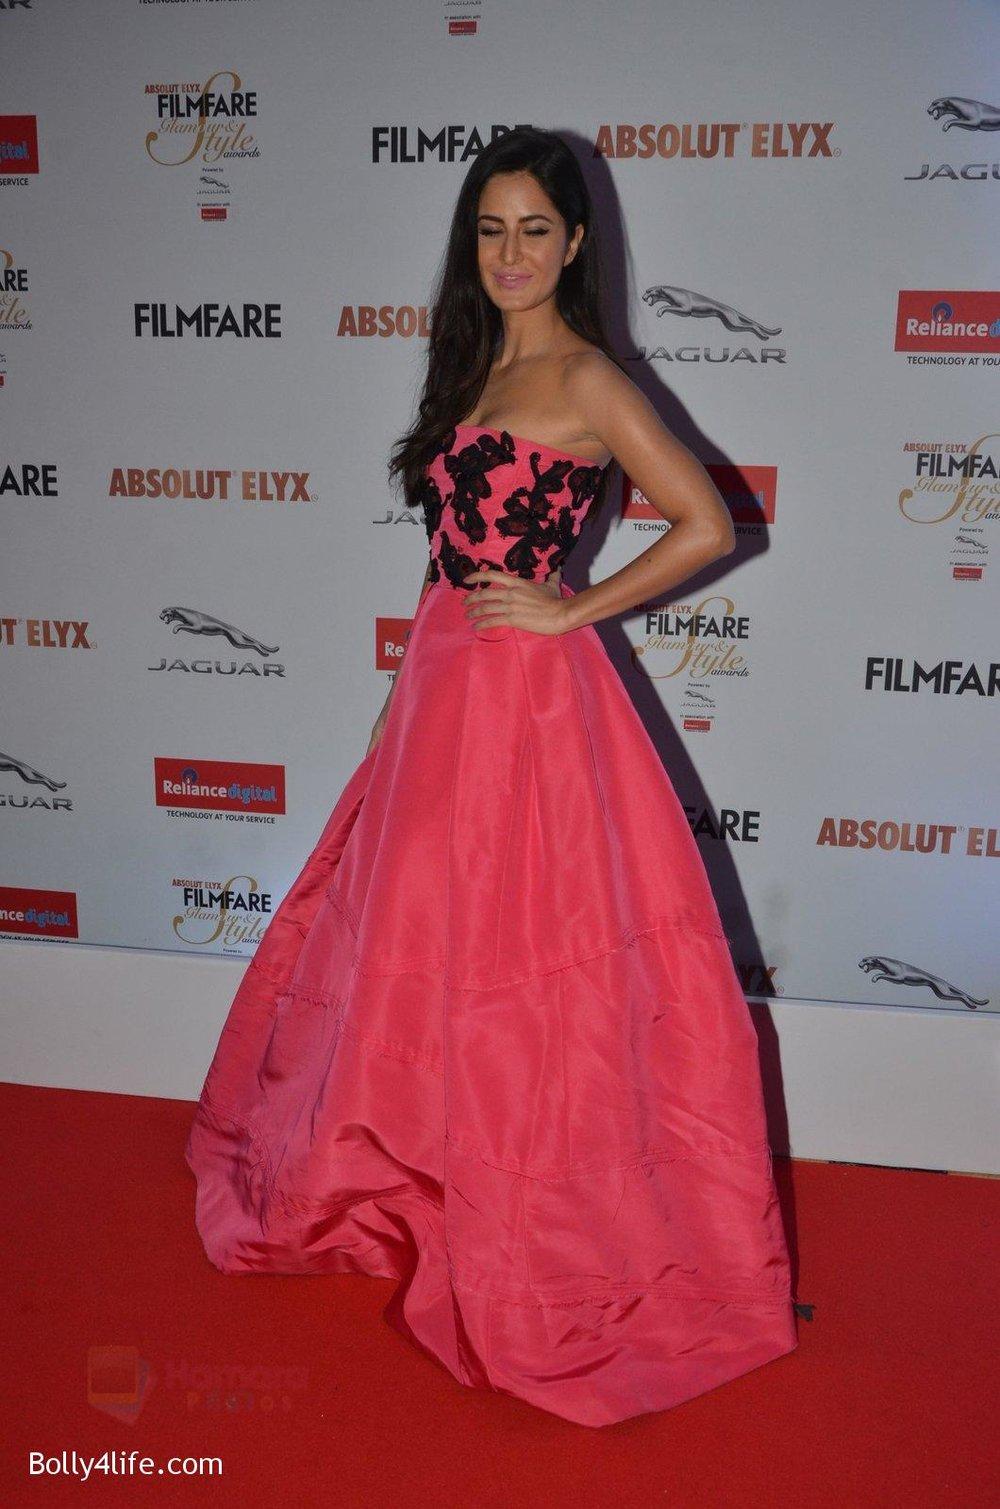 Katrina-Kaif-at-Filmfare-Glamour-Style-Awards-2016-in-Mumbai-on-15th-Oct-2016-1949.jpg